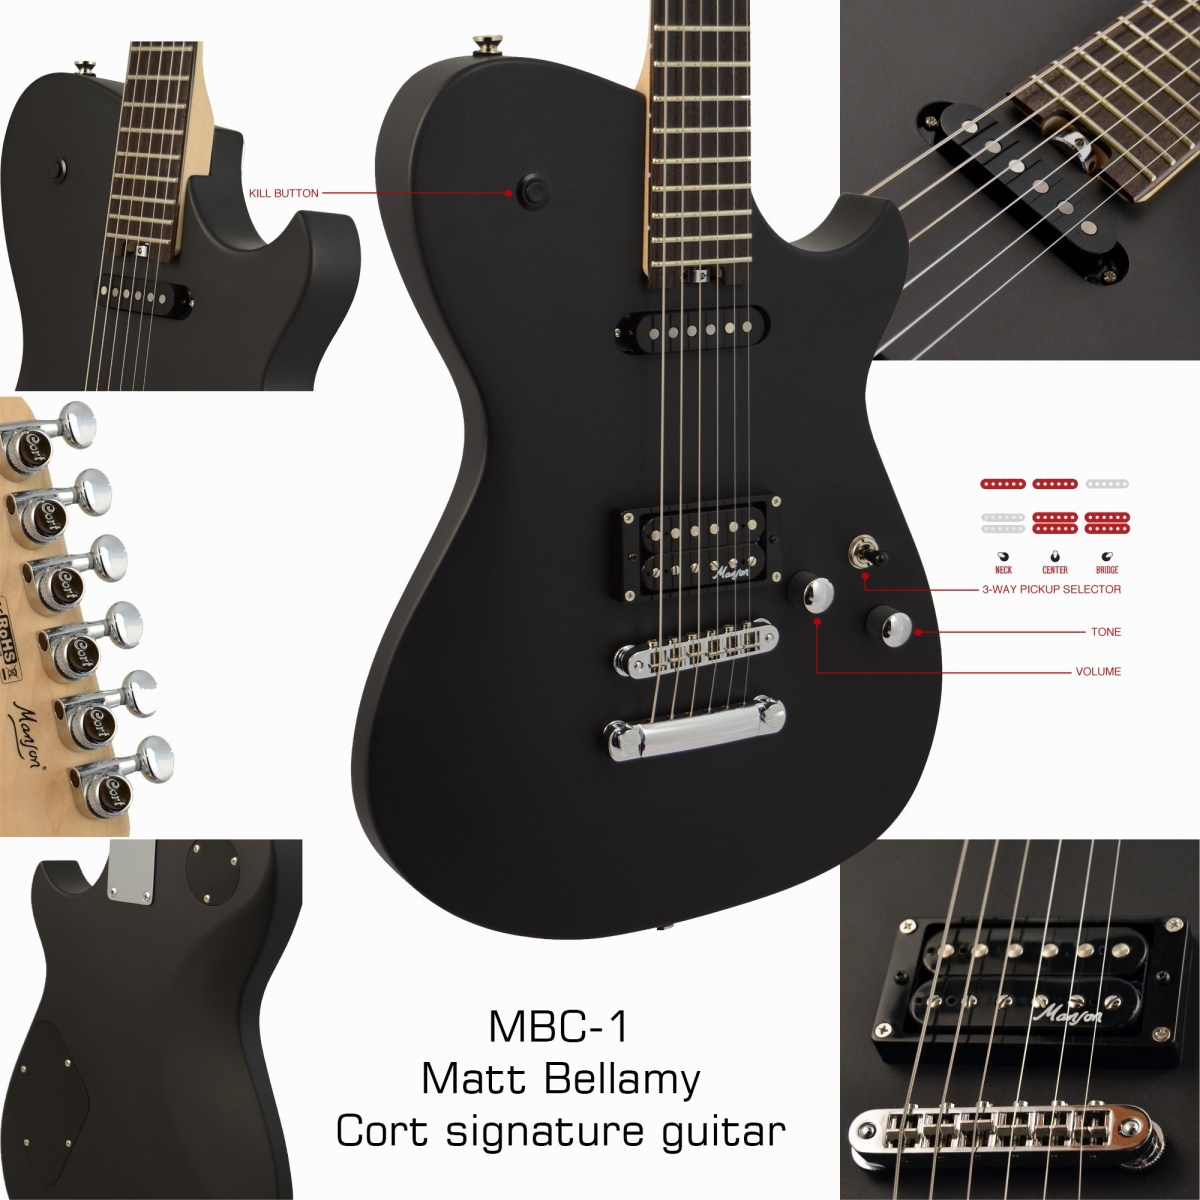 MBC-1 Bellamy Cort guitar specs